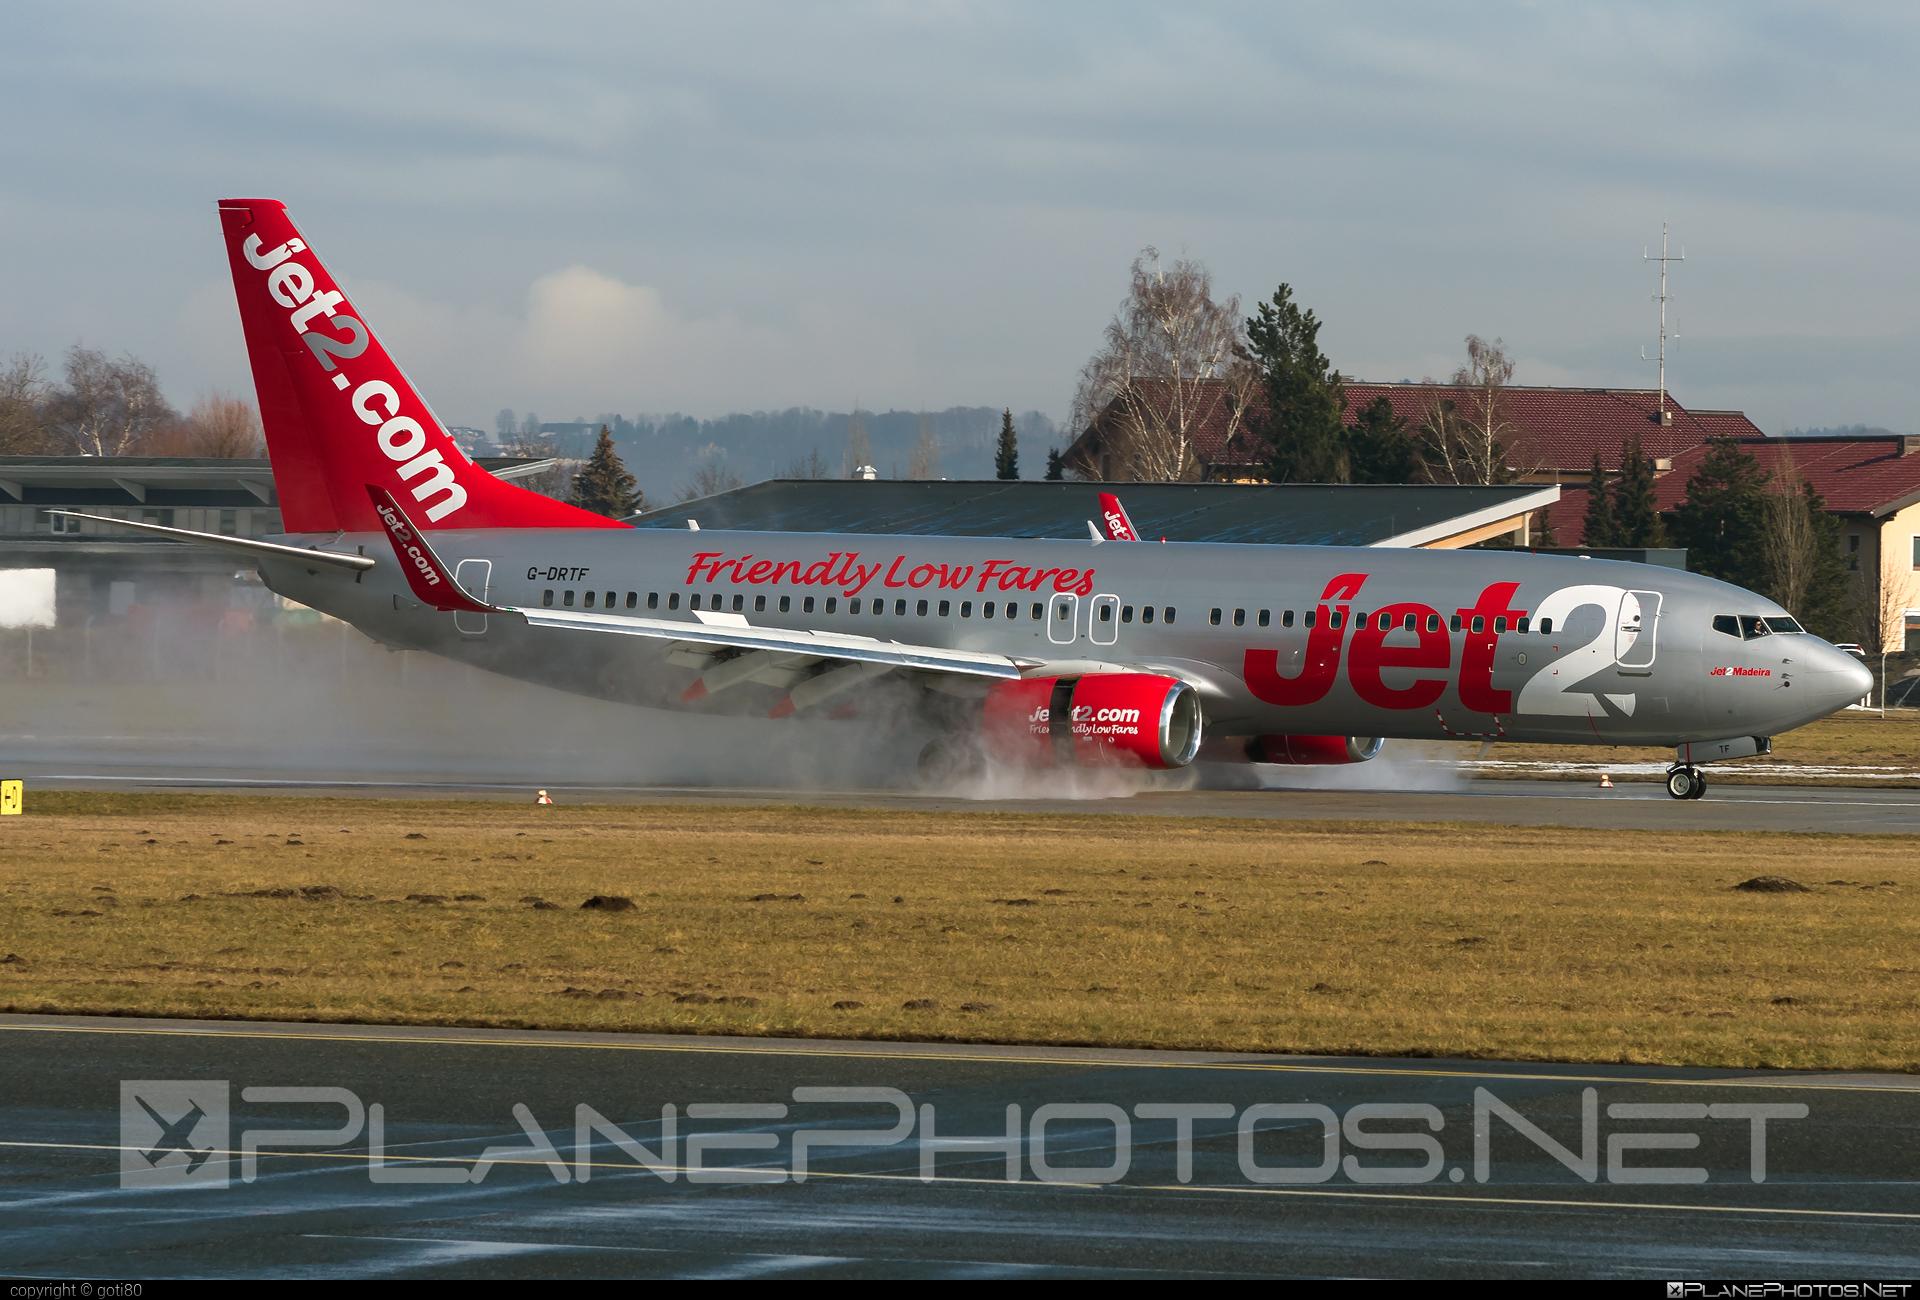 Boeing 737-800 - G-DRTF operated by Jet2 #b737 #b737nextgen #b737ng #boeing #boeing737 #jet2